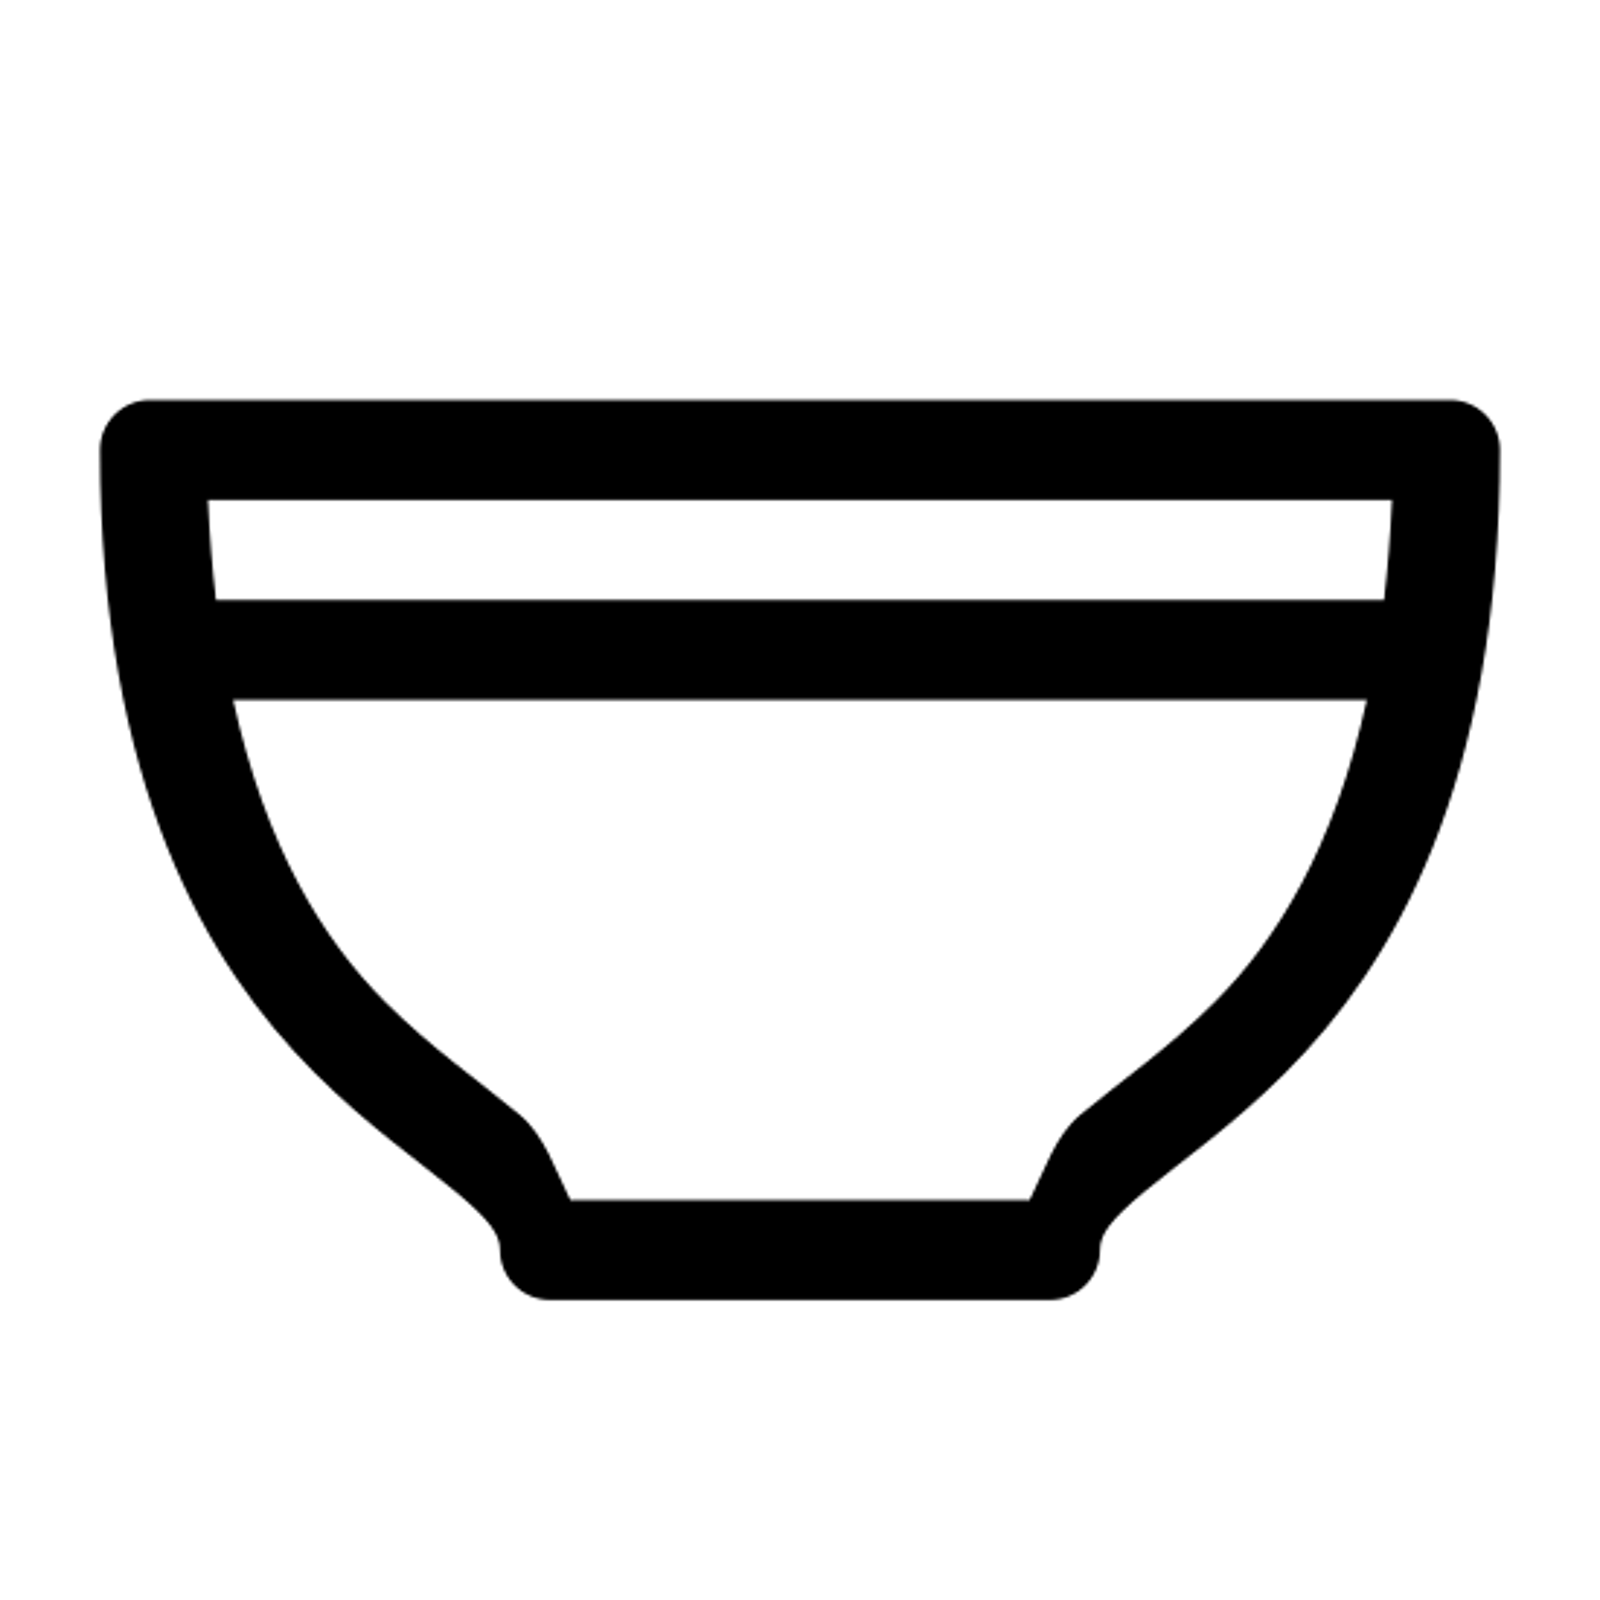 Miska sałatki icon